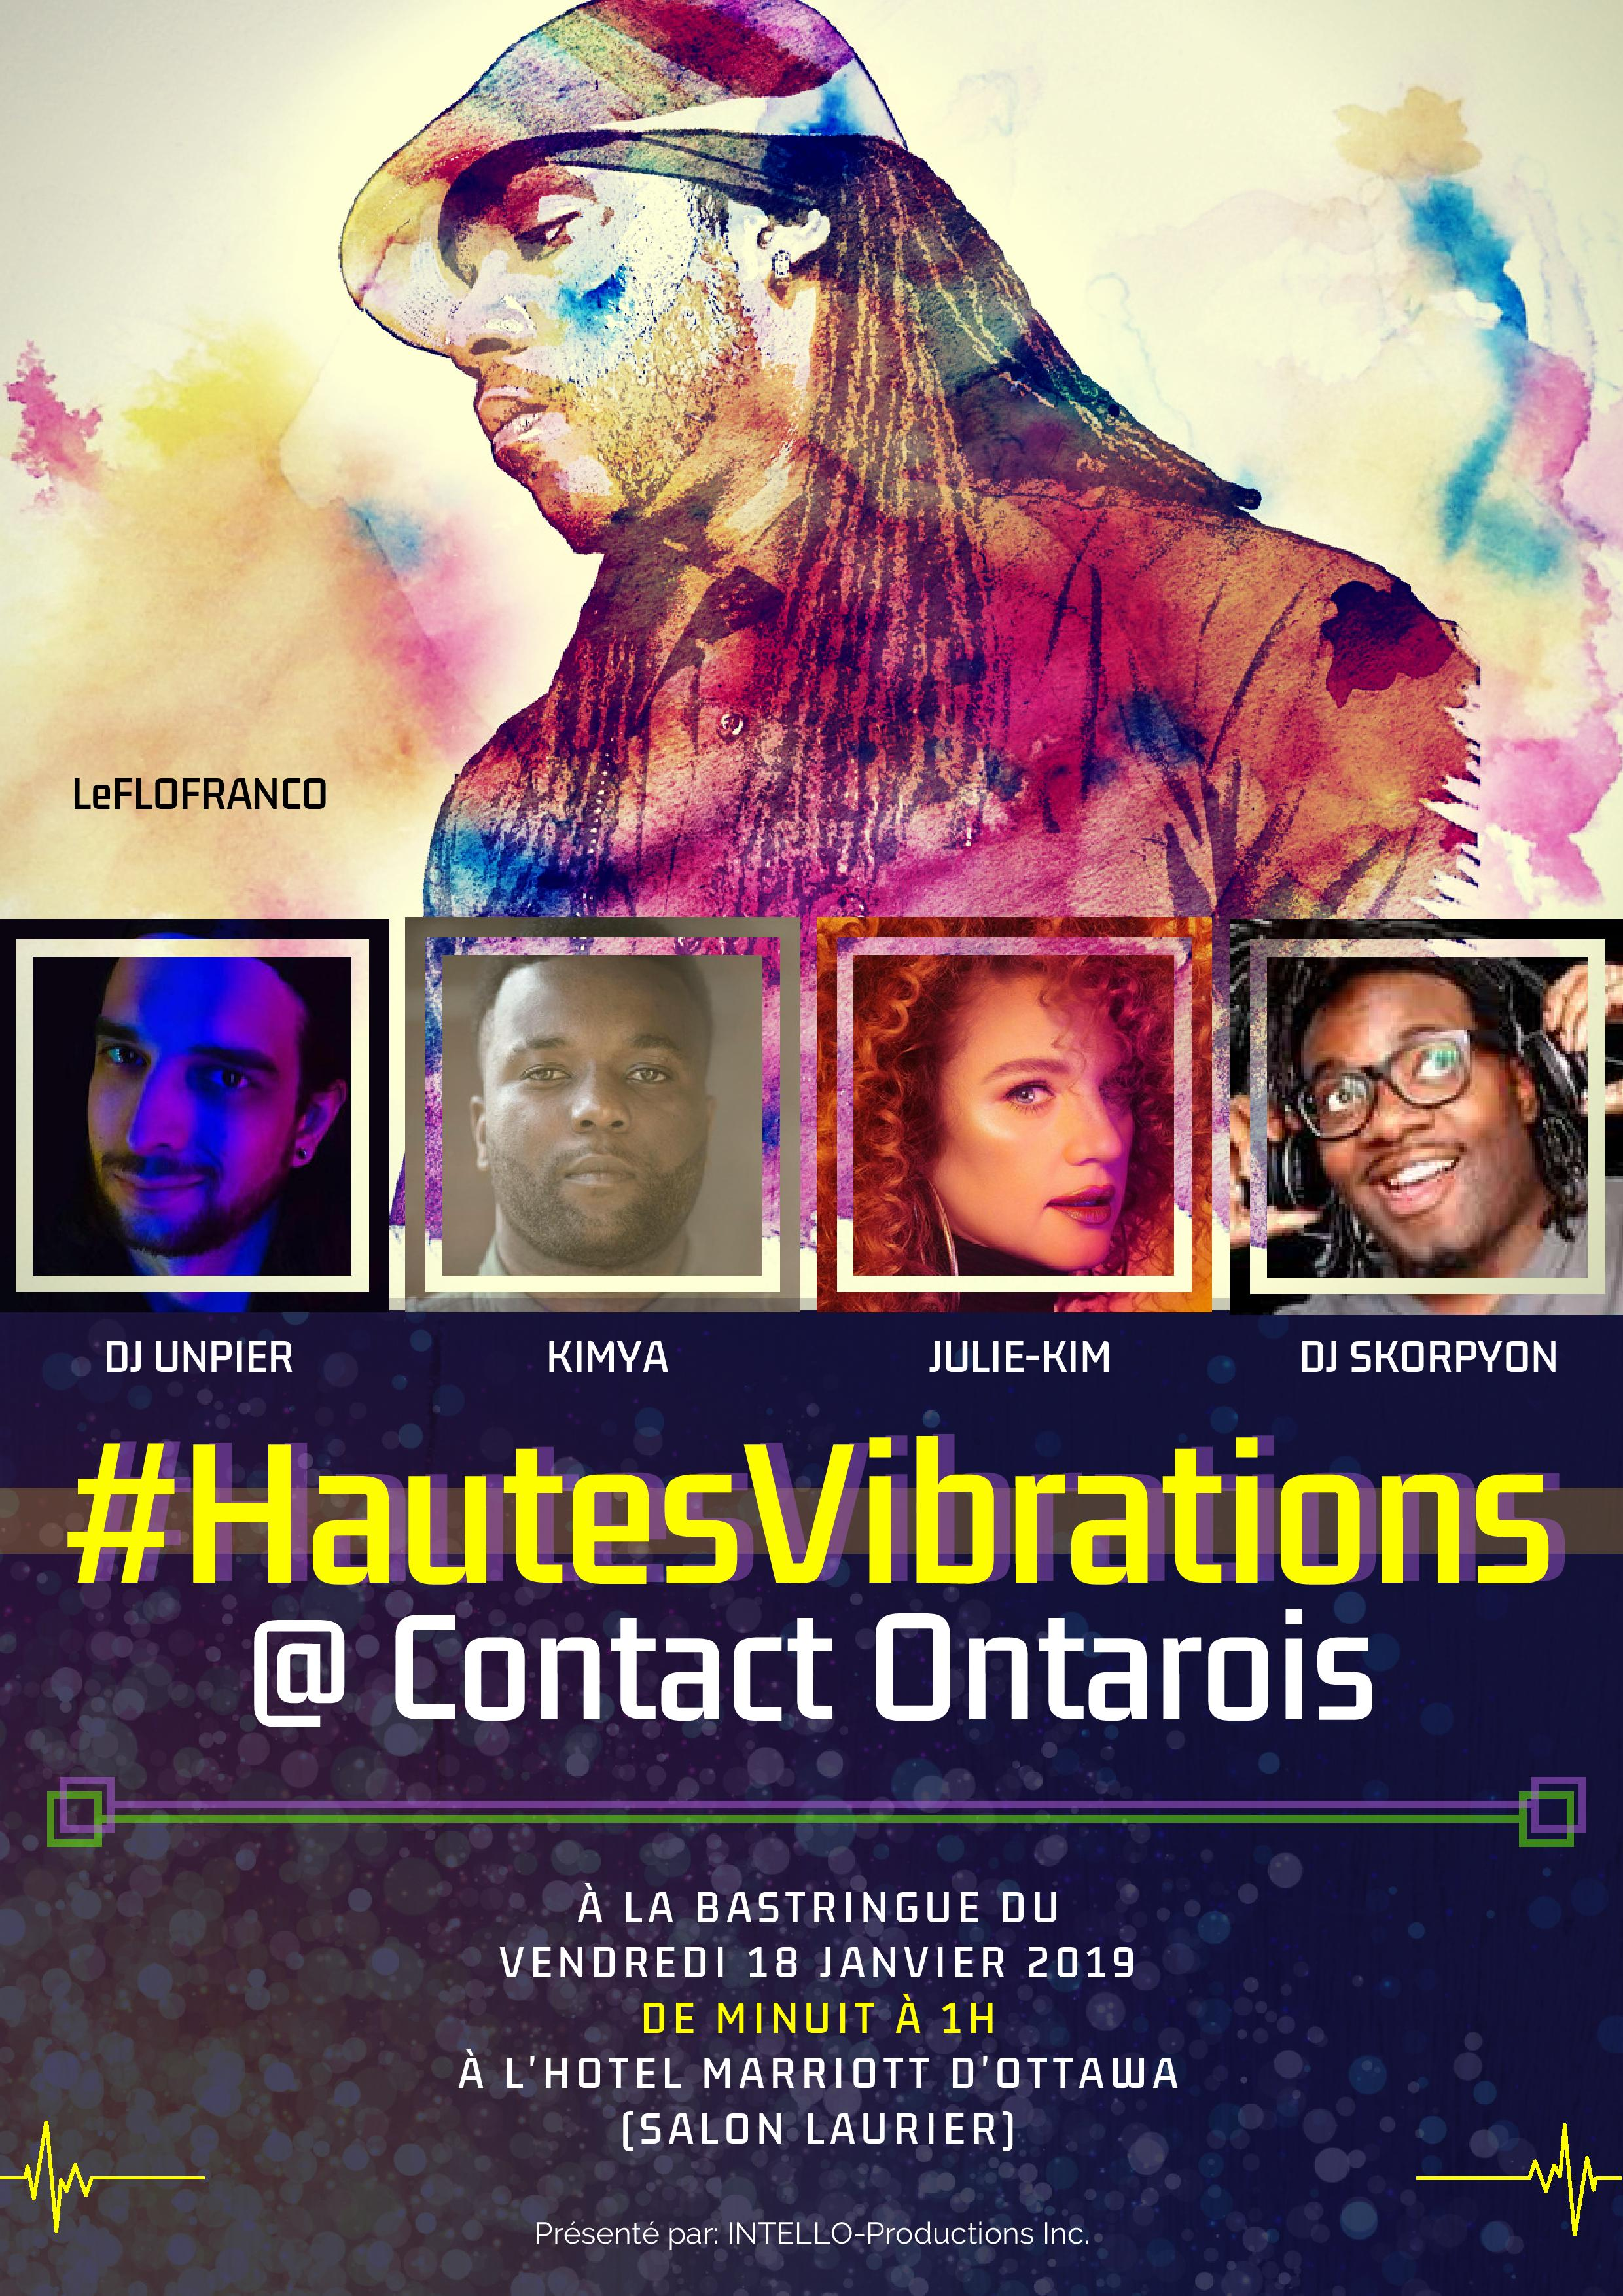 #HautesVibrations @ Contact Ontarois